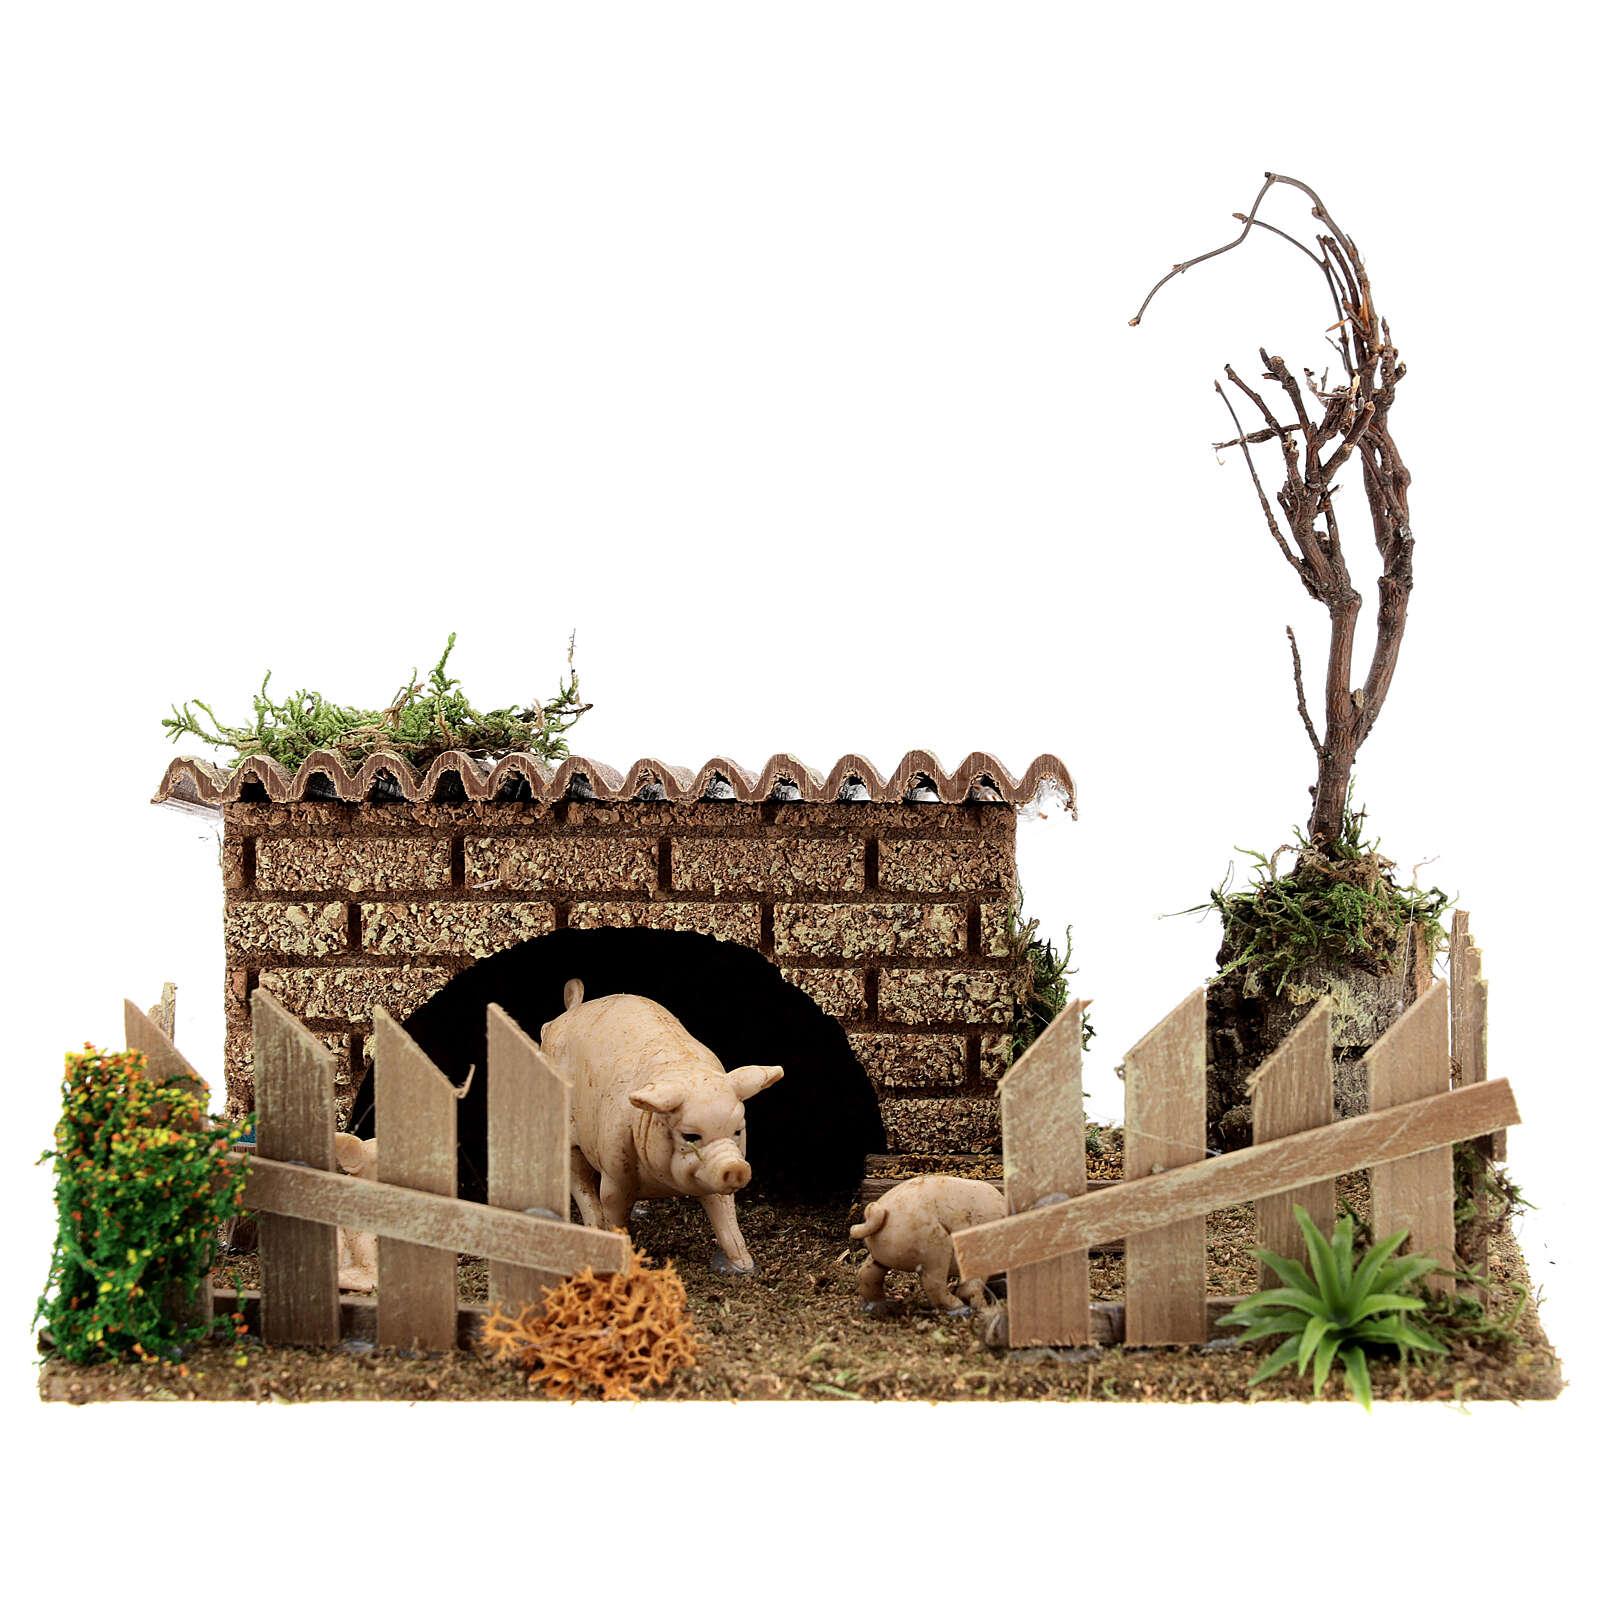 Pocilga miniatura para presépio de Natal; medidas: 19x16x16 4